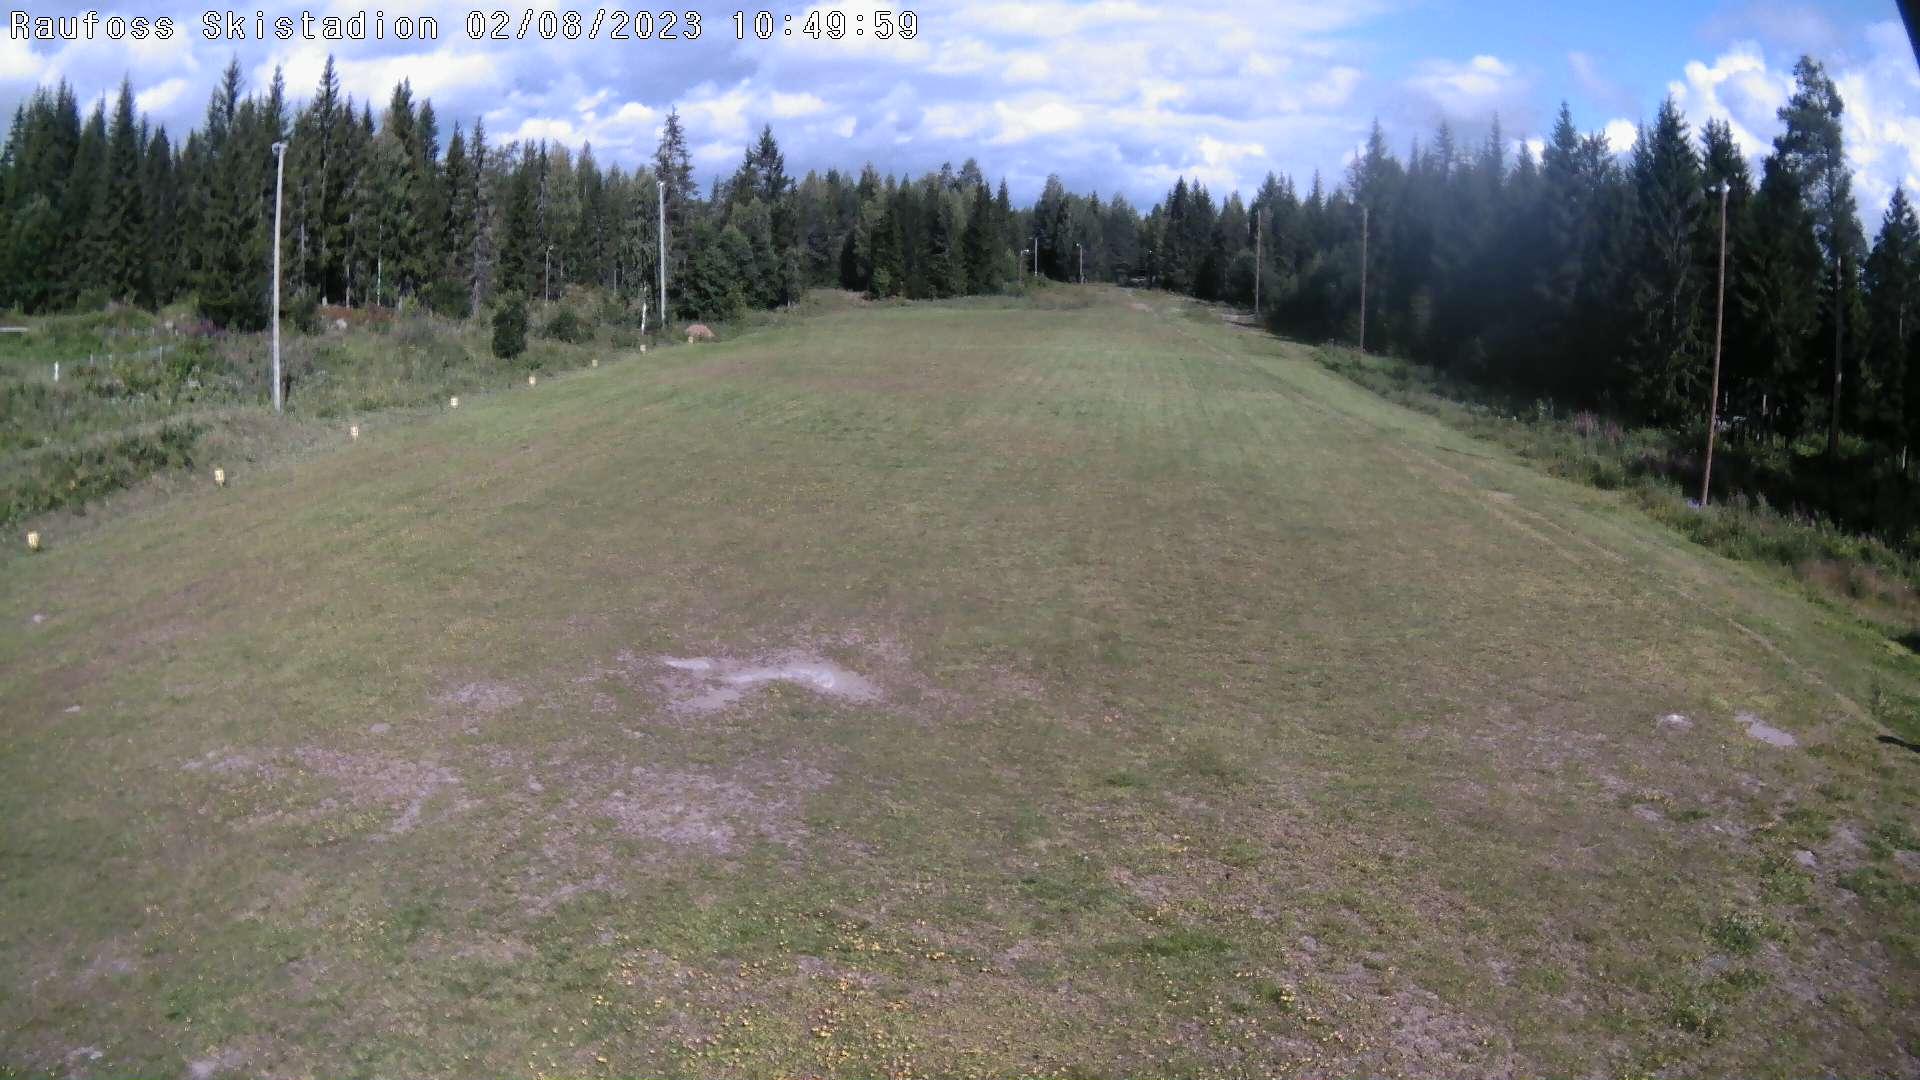 Webkamera Skistadion